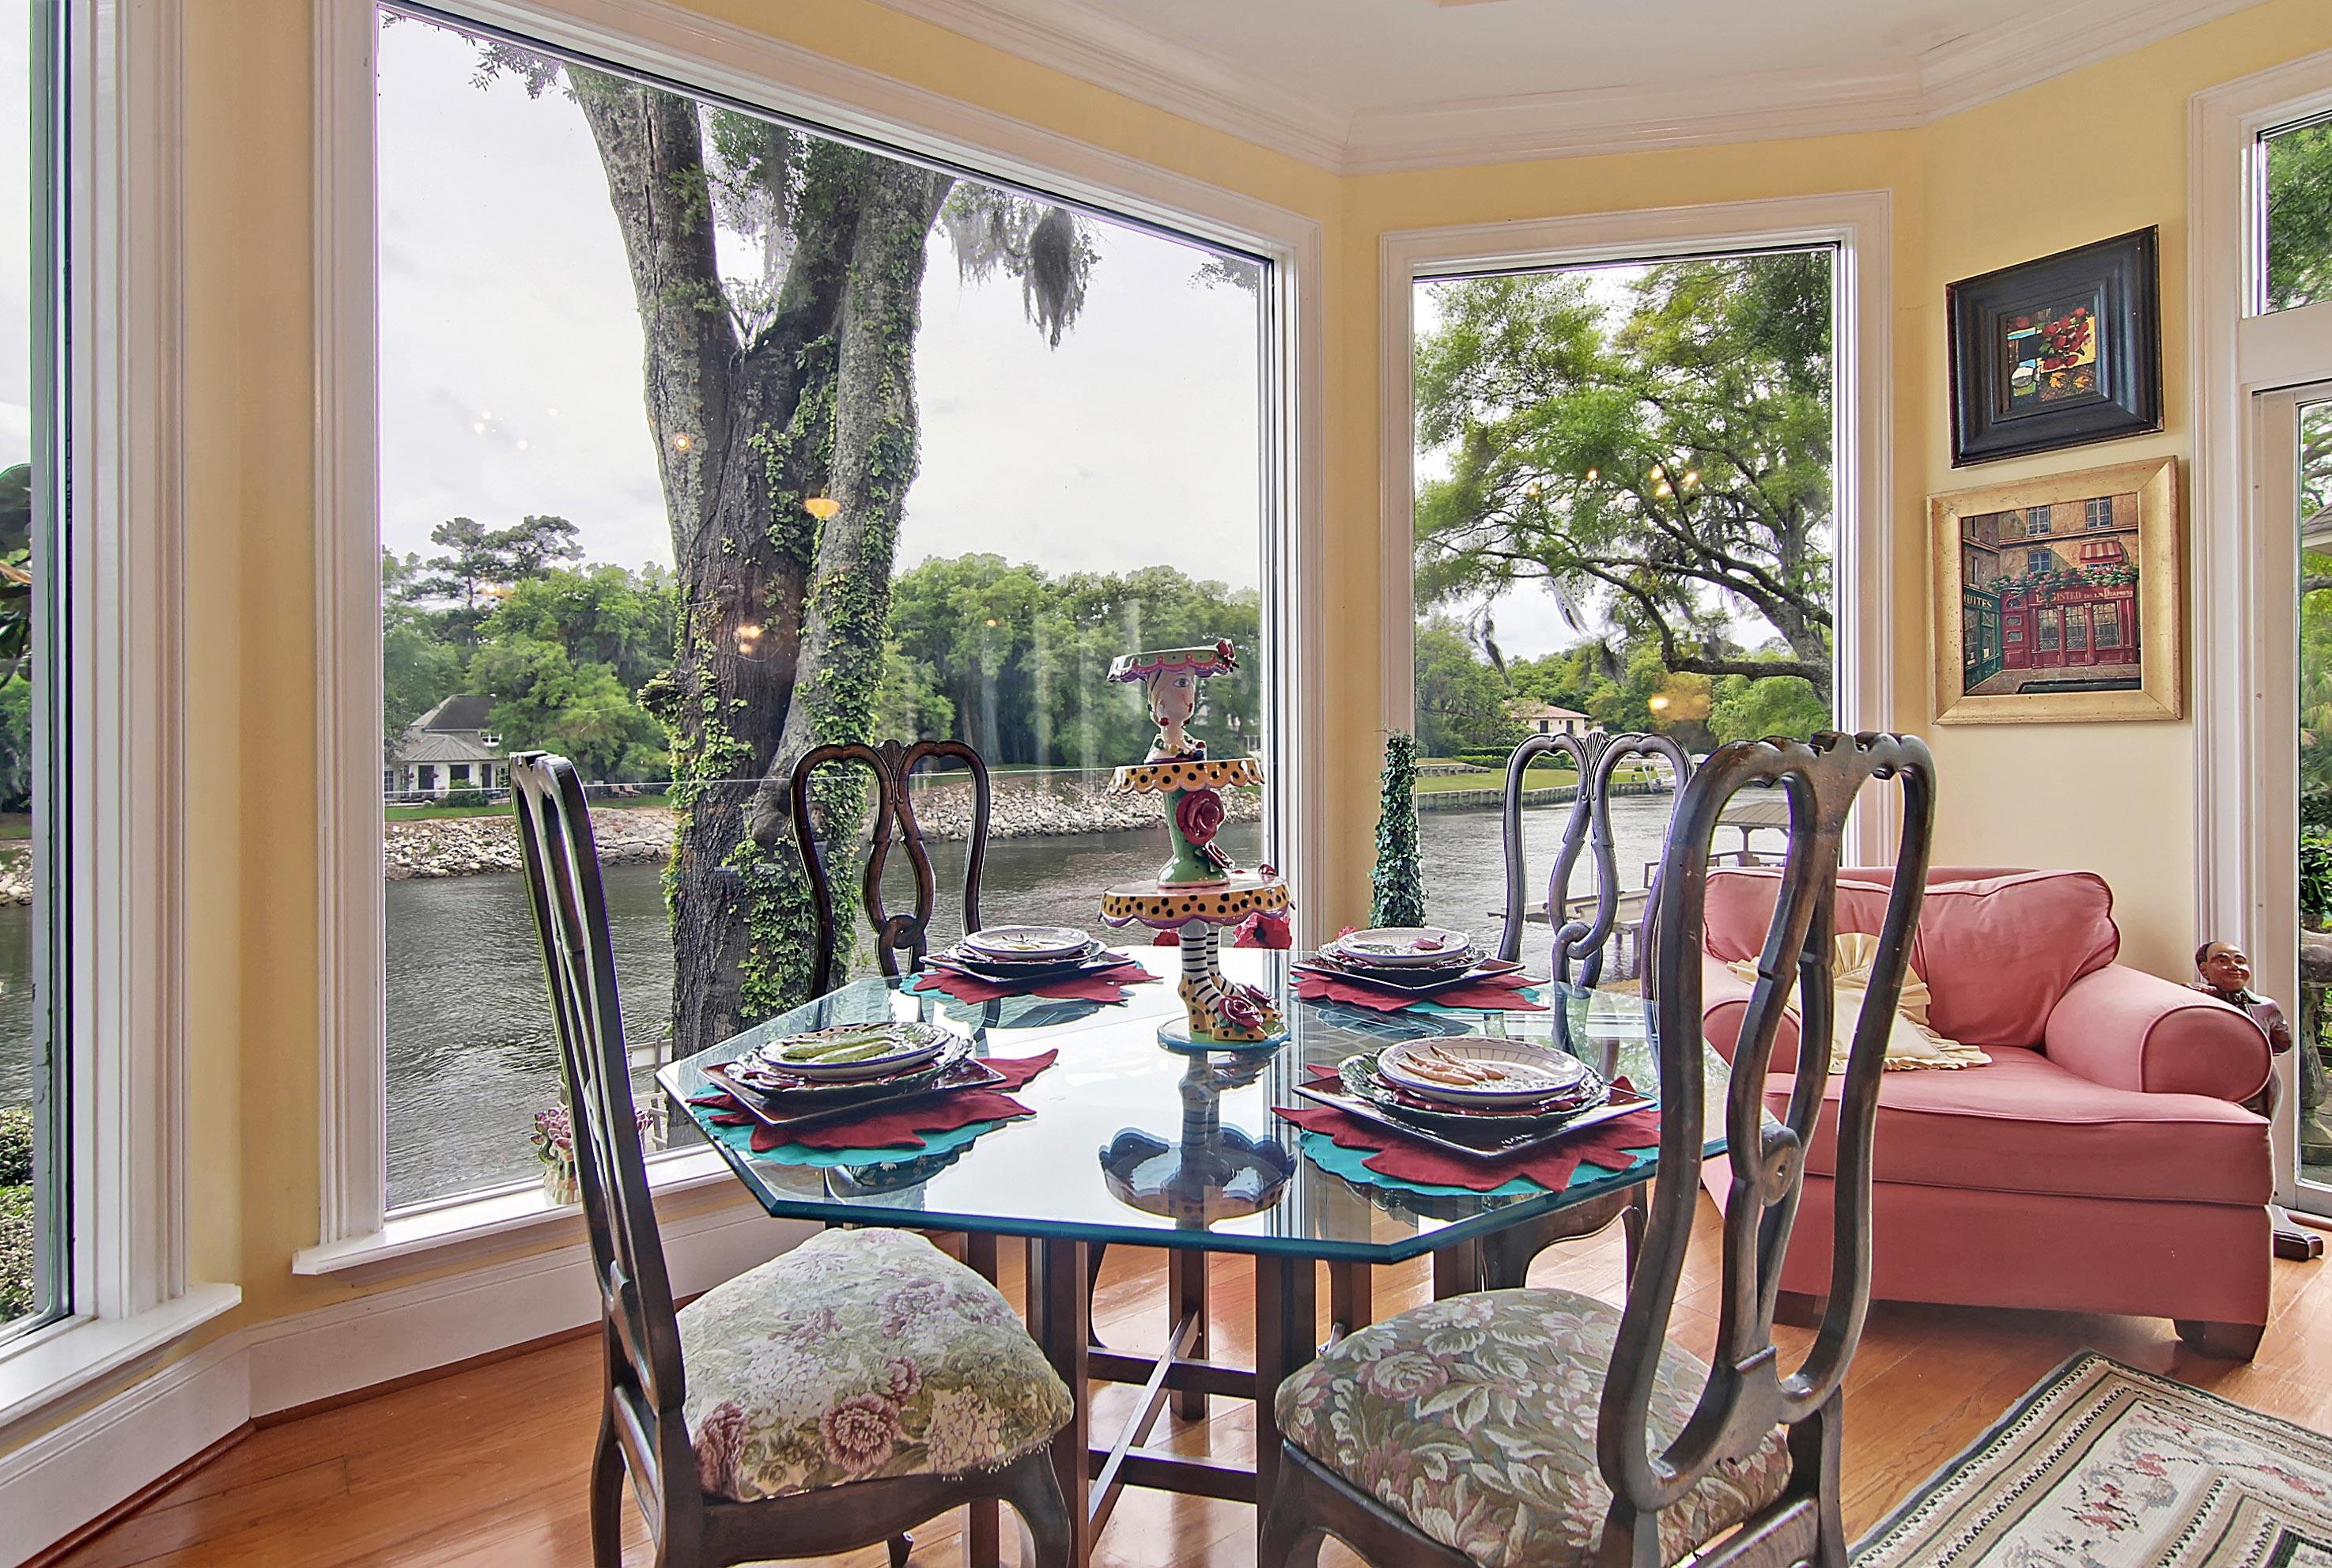 Edgewater Park Homes For Sale - 1323 Edgewater, Charleston, SC - 60